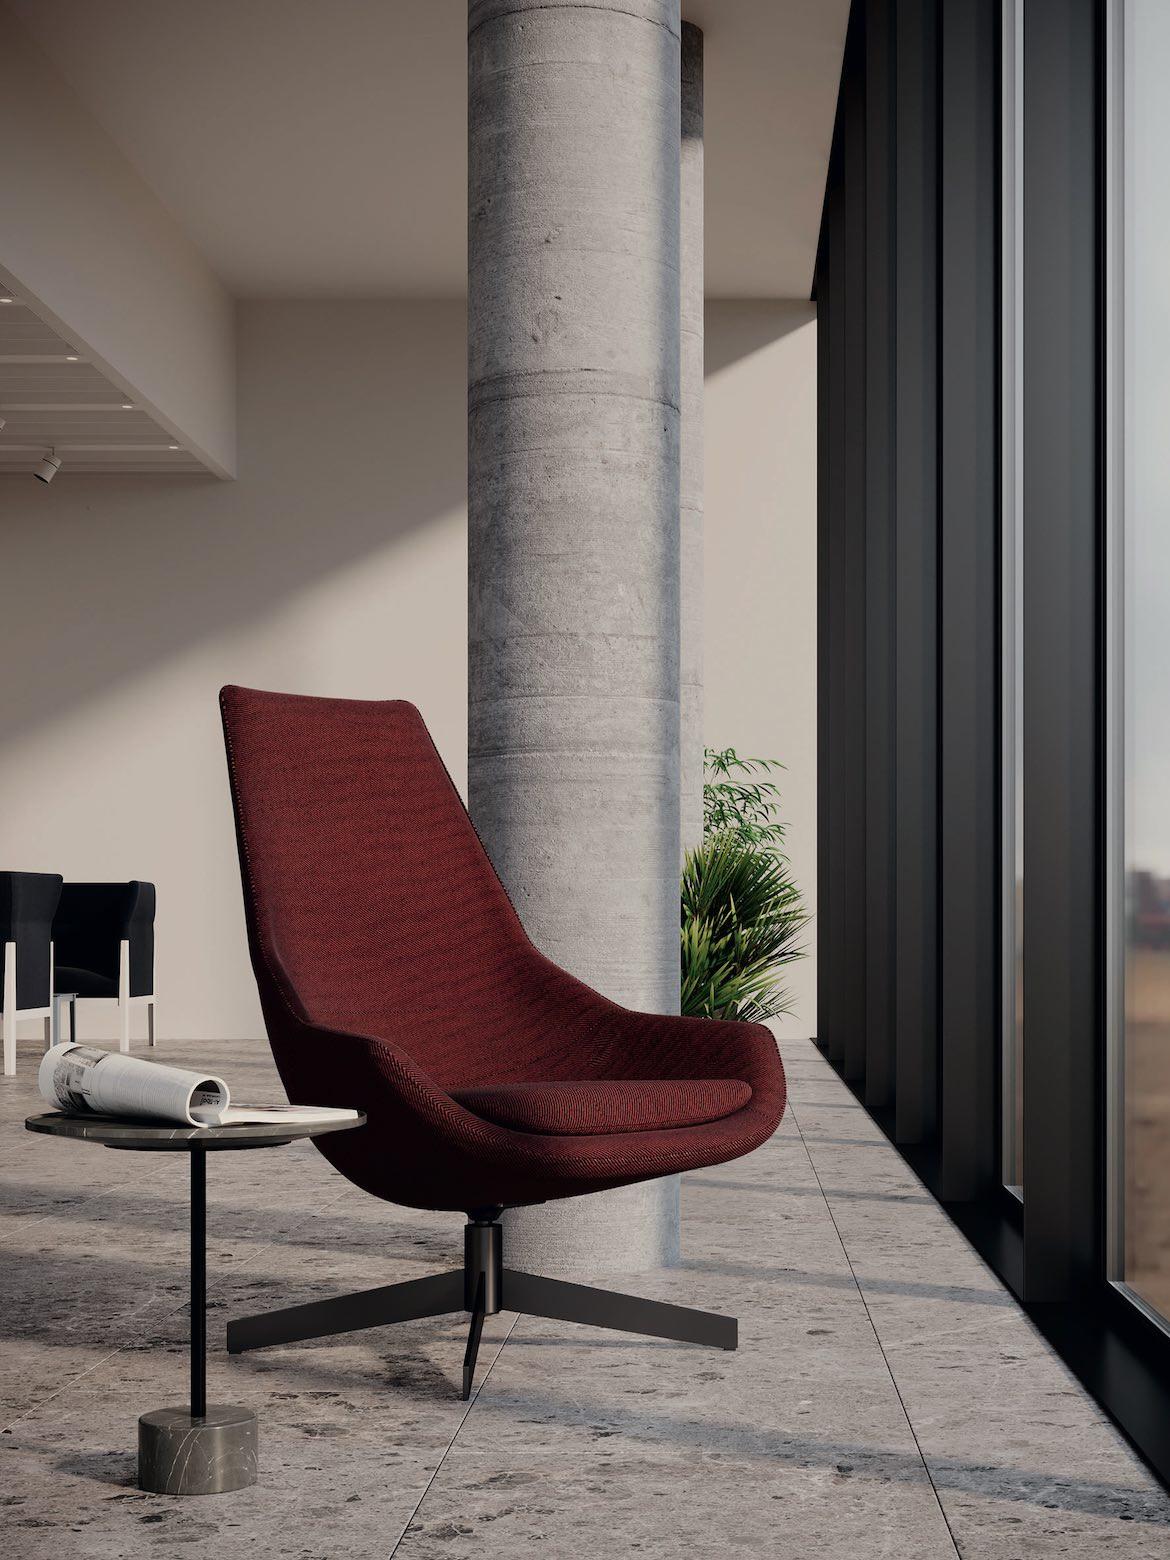 A red armchair by Jeffrey Bernett sits in an airport environment, Milan Design Week.